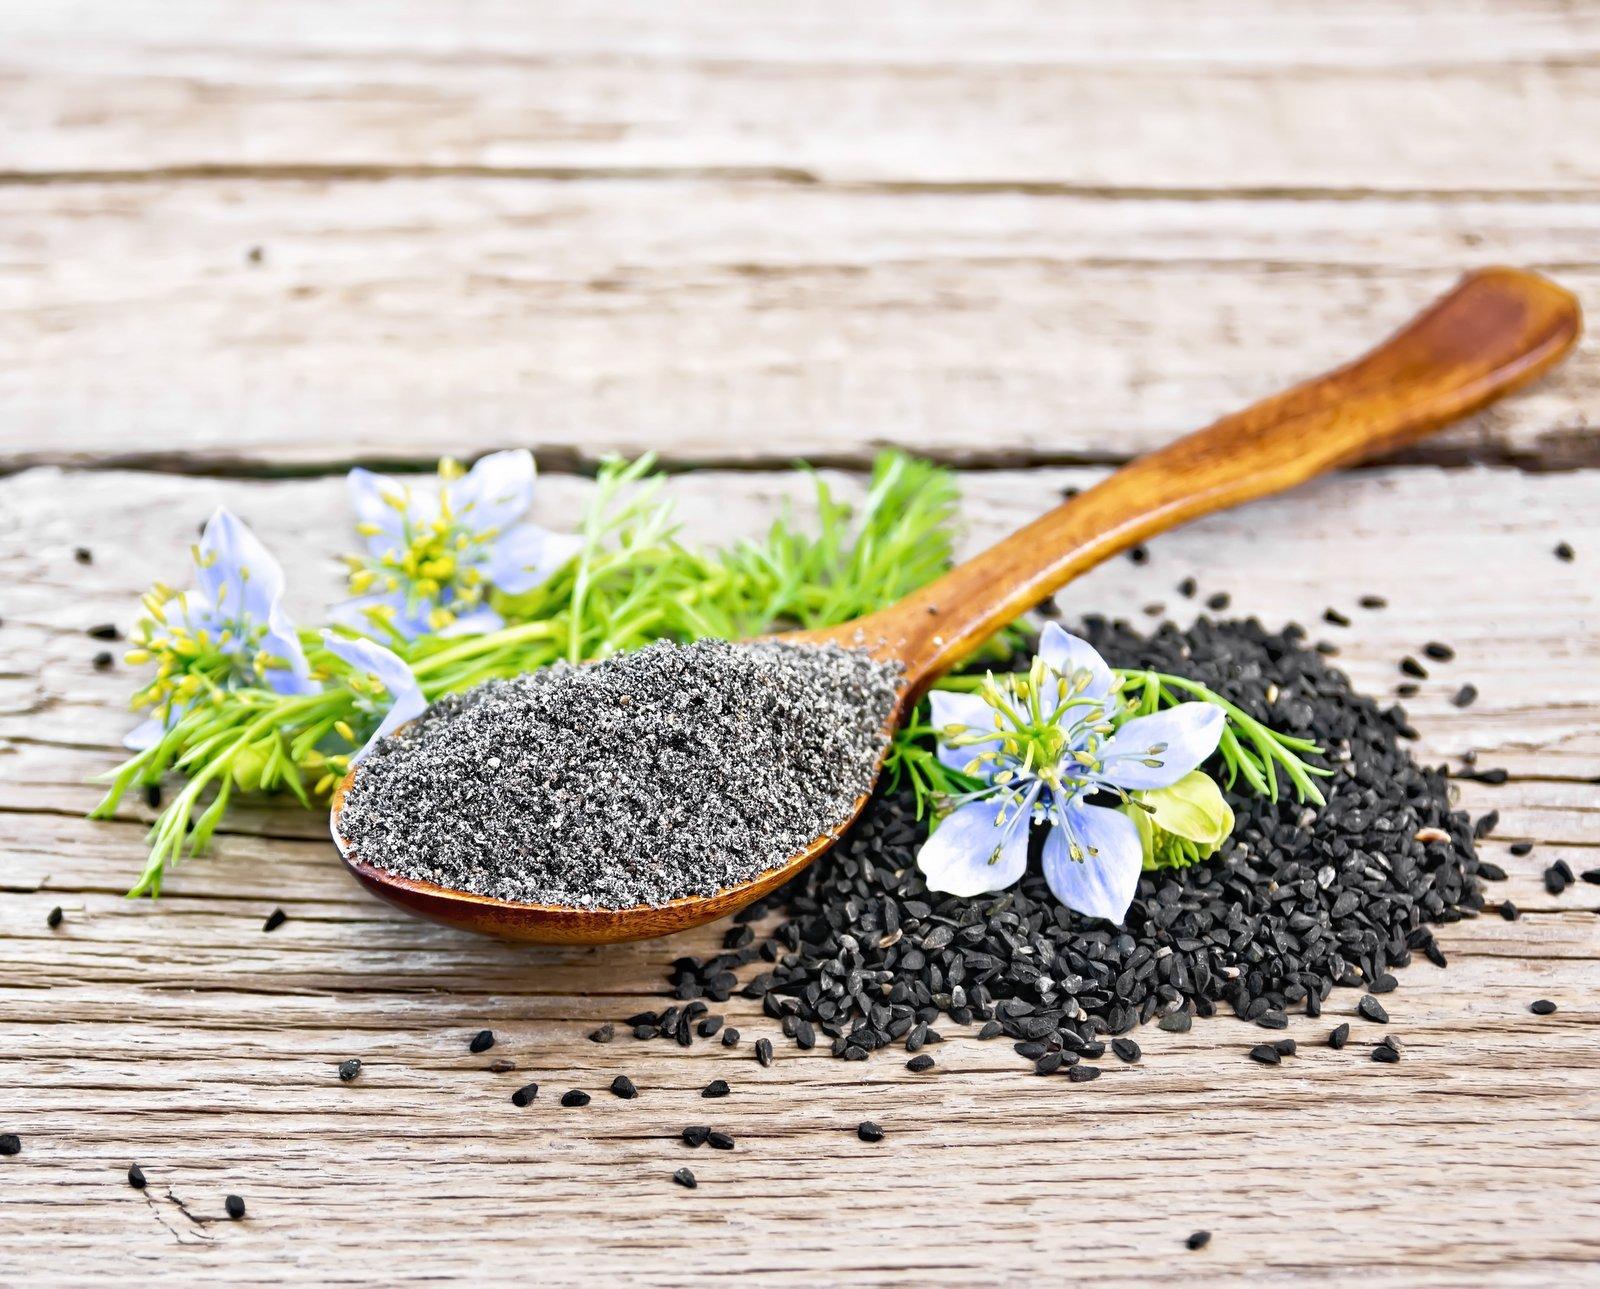 Nigella flower and black seeds